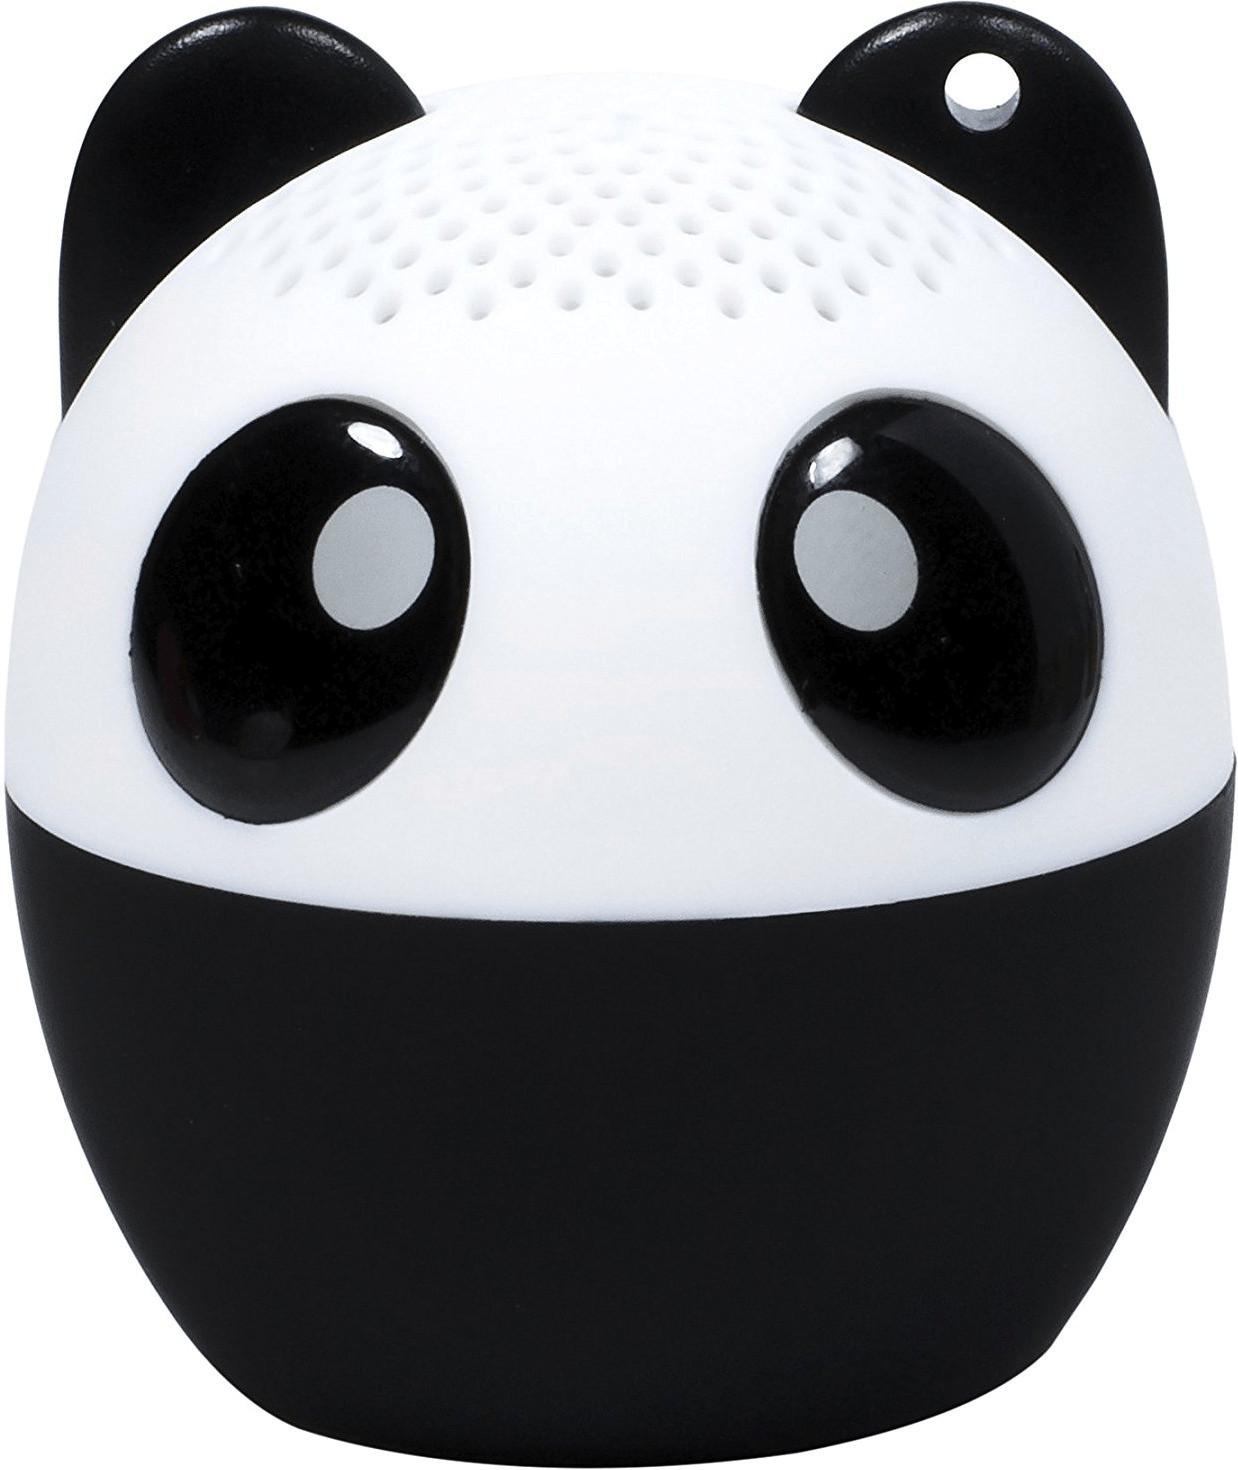 Image of ThumbsUp Swipe Wireless Animal Speaker Penny the Panda Speaker